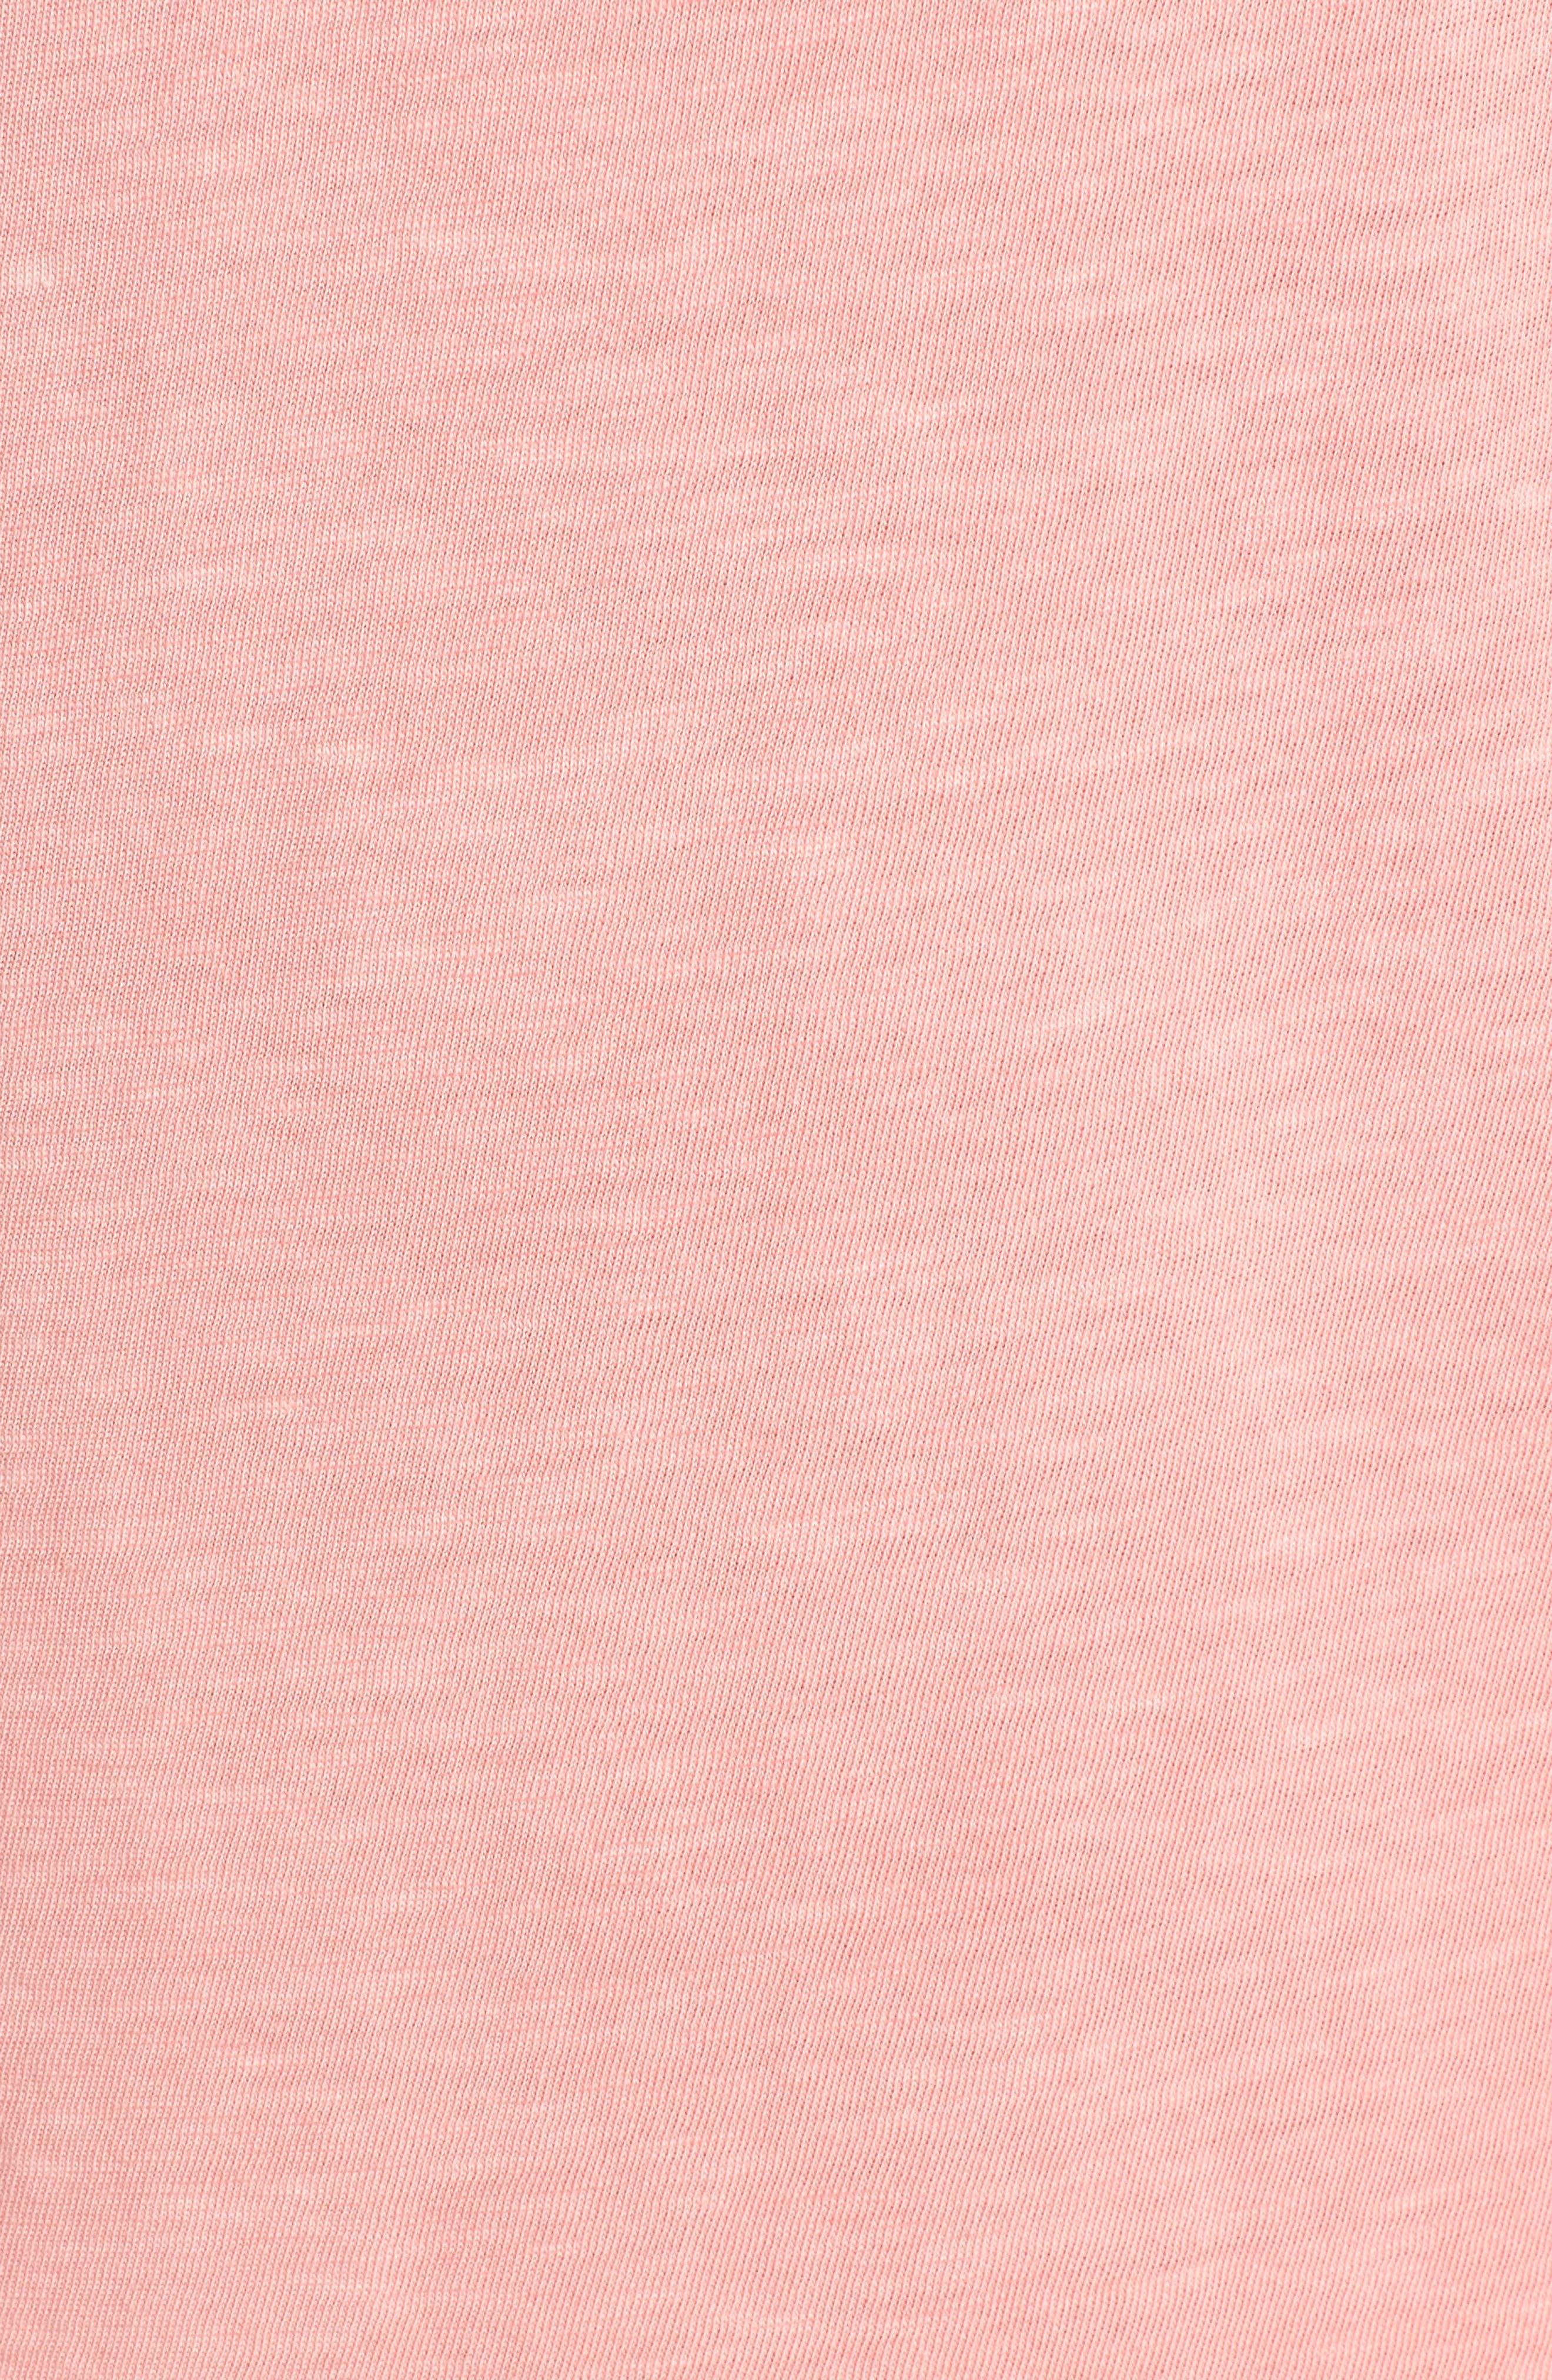 Ruffle Sleeve Shift Dress,                             Alternate thumbnail 6, color,                             CACTUS FLOWER